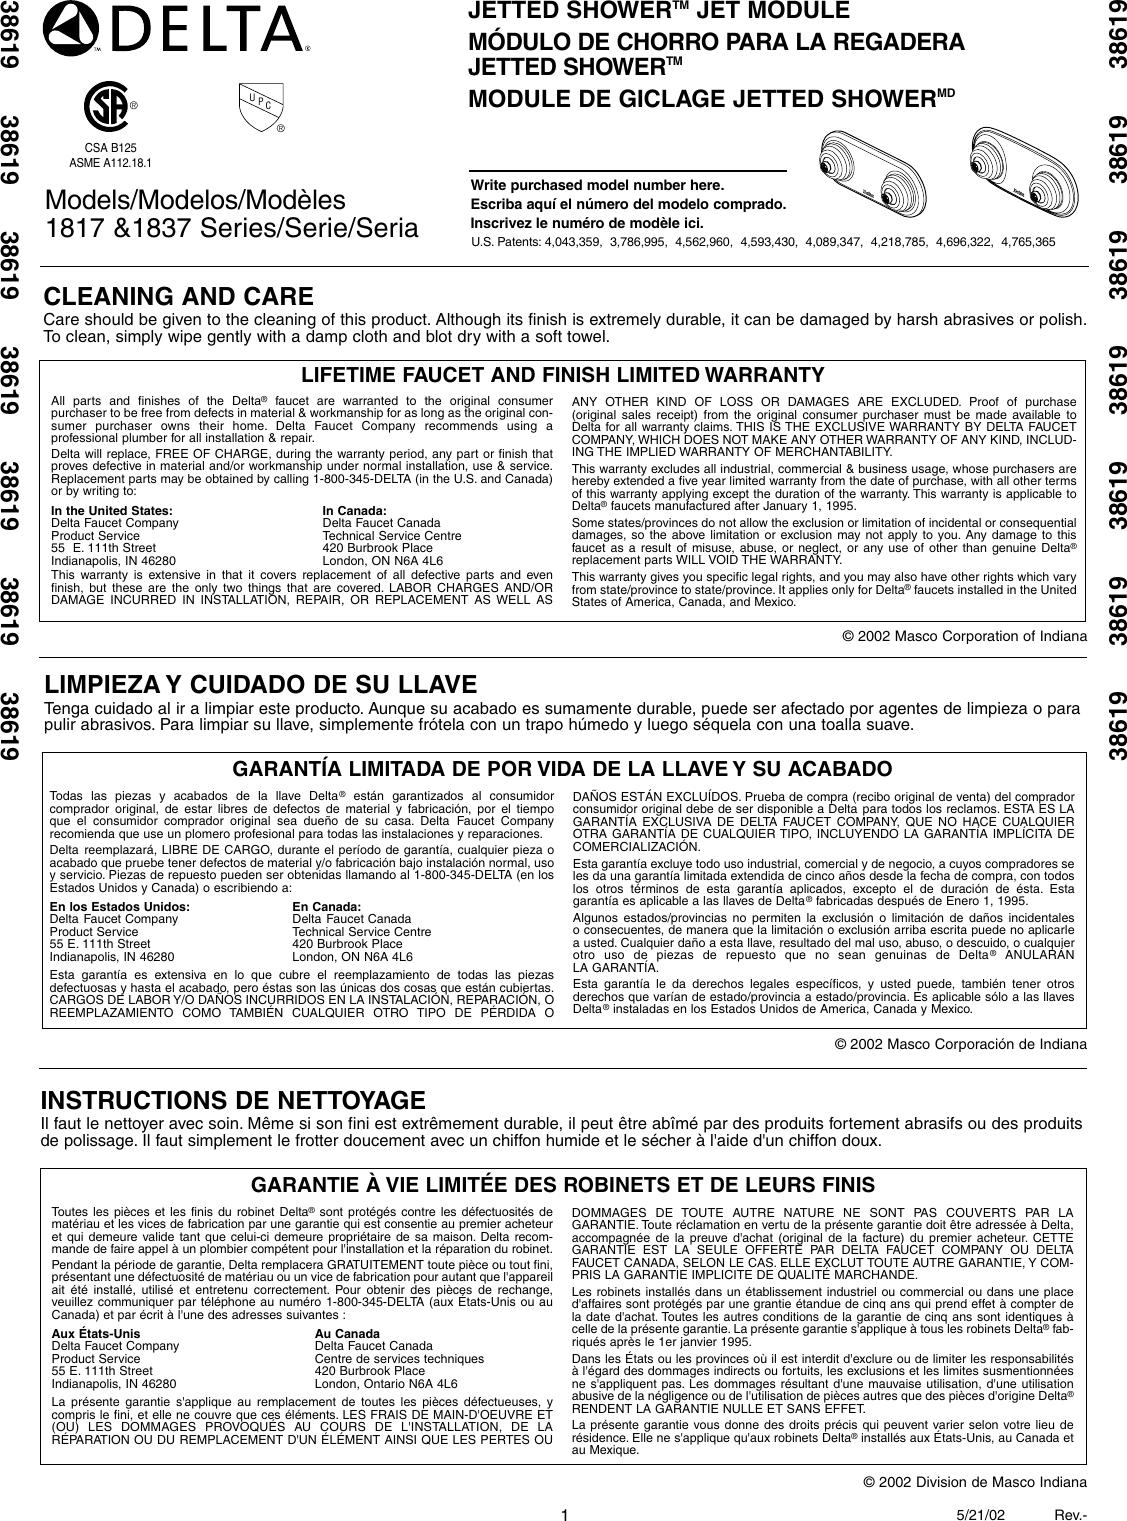 univex 1837 38619 user manual to the 6361d101 14b5 411d 91e2 rh usermanual wiki Meat Grinder Attachment Berkel Brand